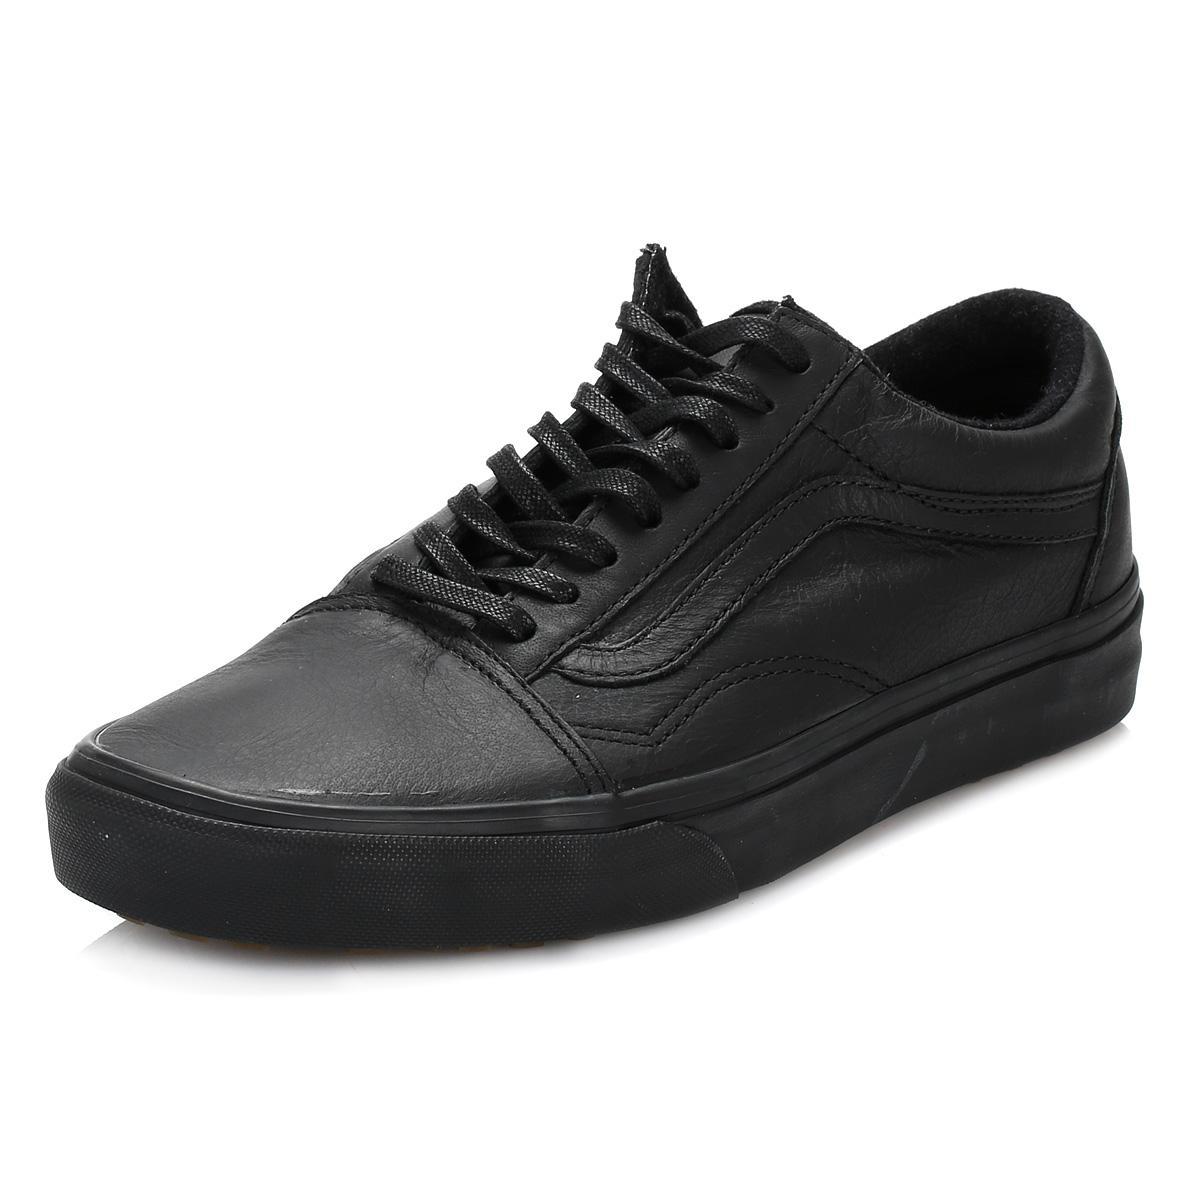 Vans Black Old Skool Mte Leather Trainers for Men